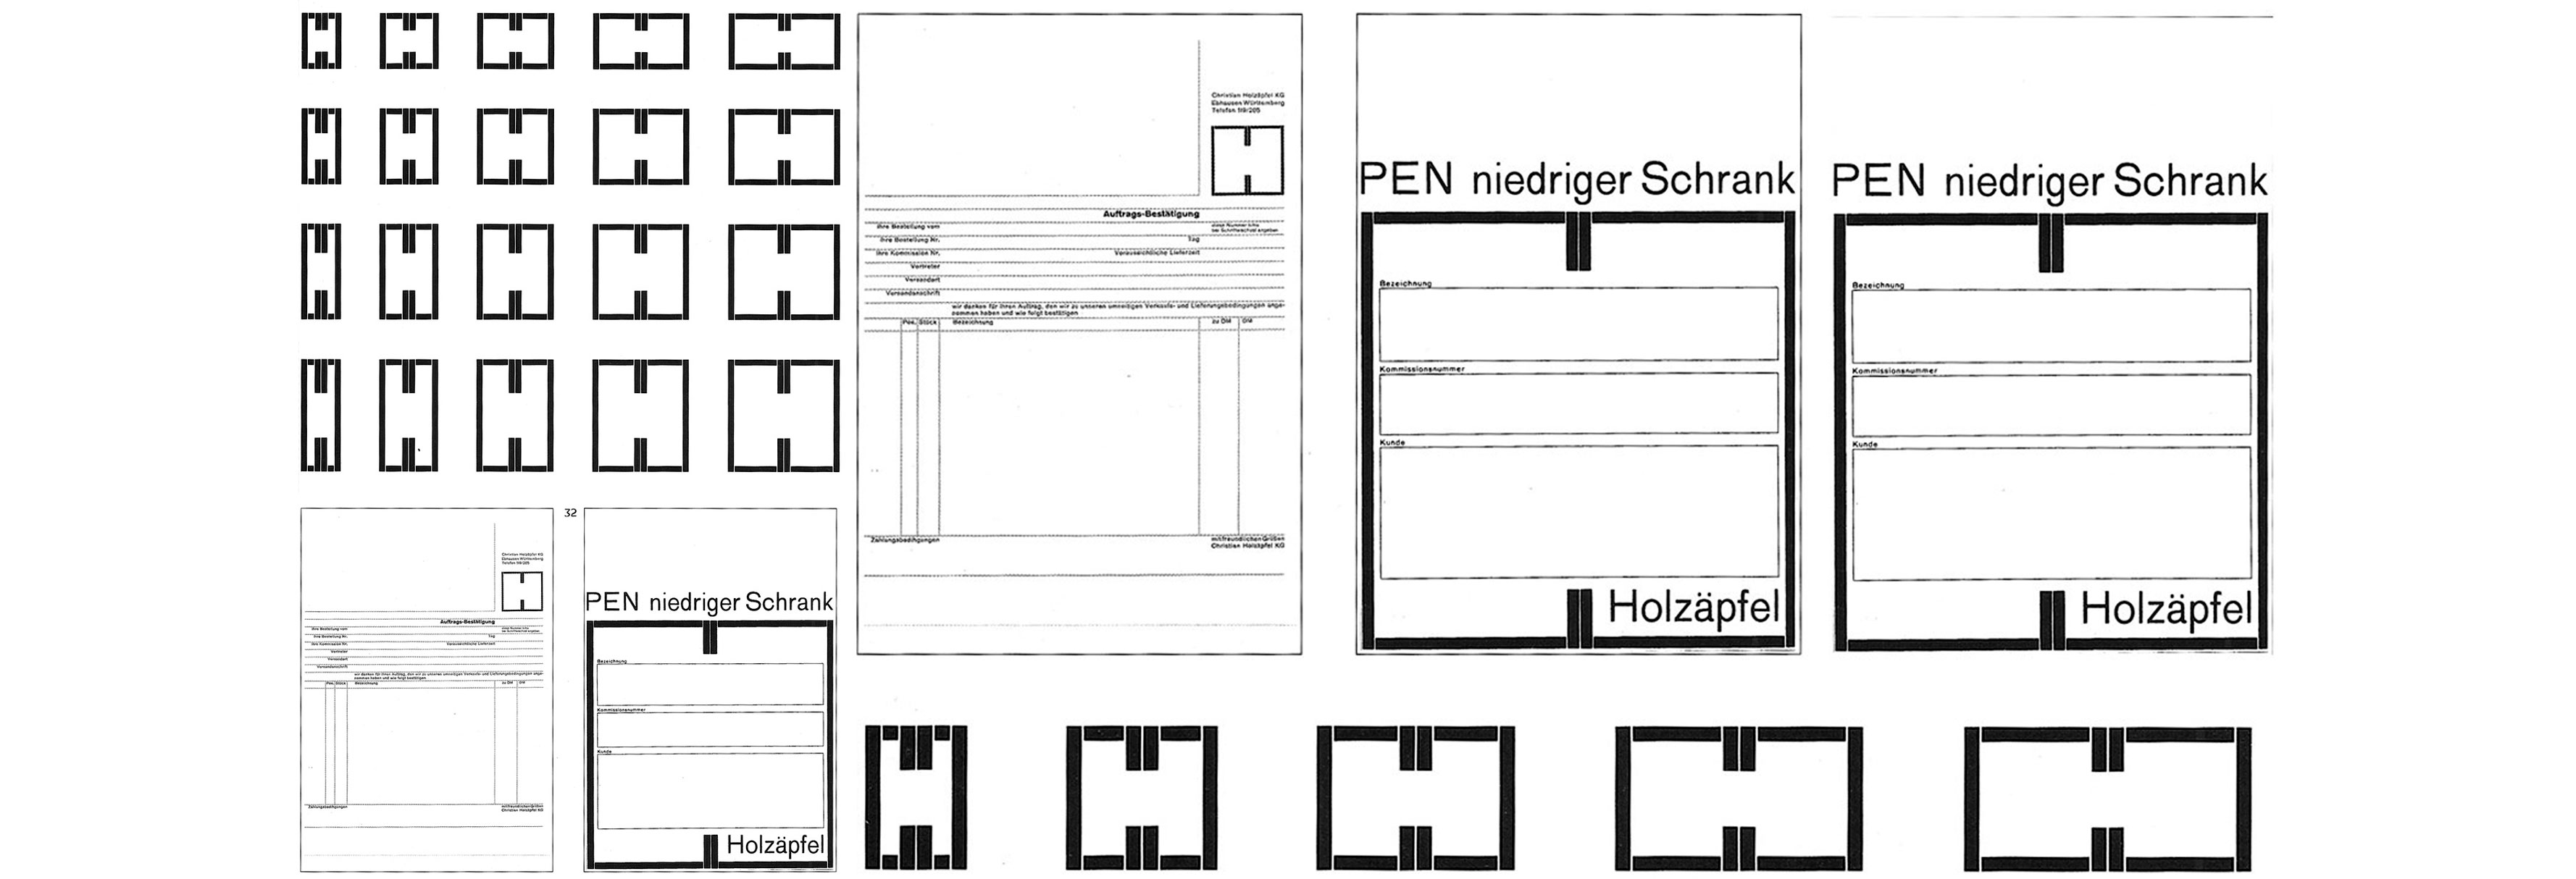 Karl-Gerstner-identity-holzapfel-1959-furniture